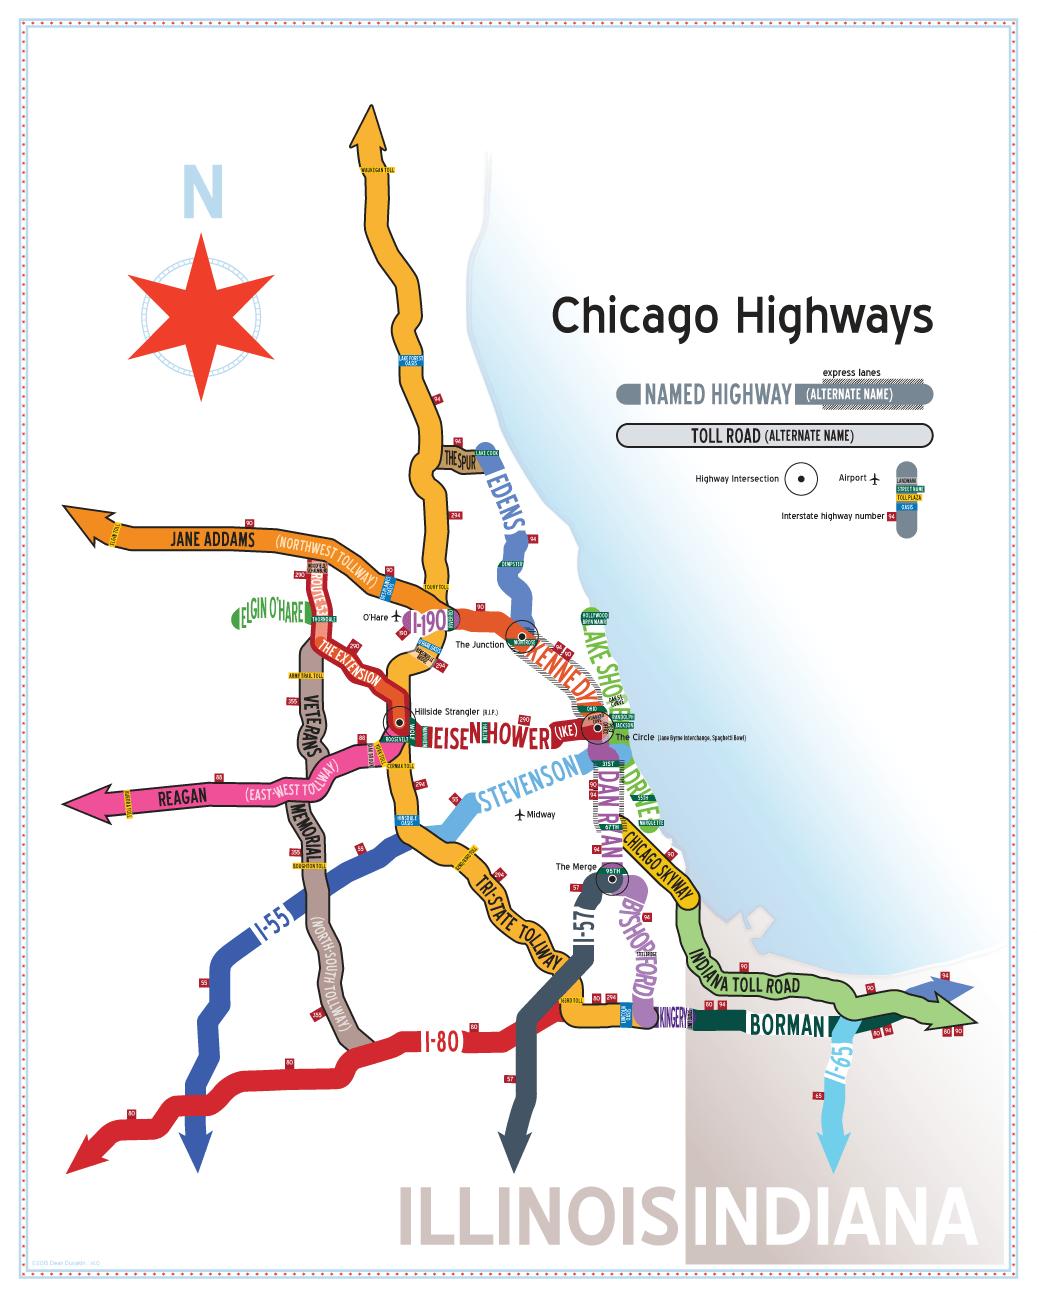 Chicago Highway Map Chicago Highway Names Map   Dean Dunakin